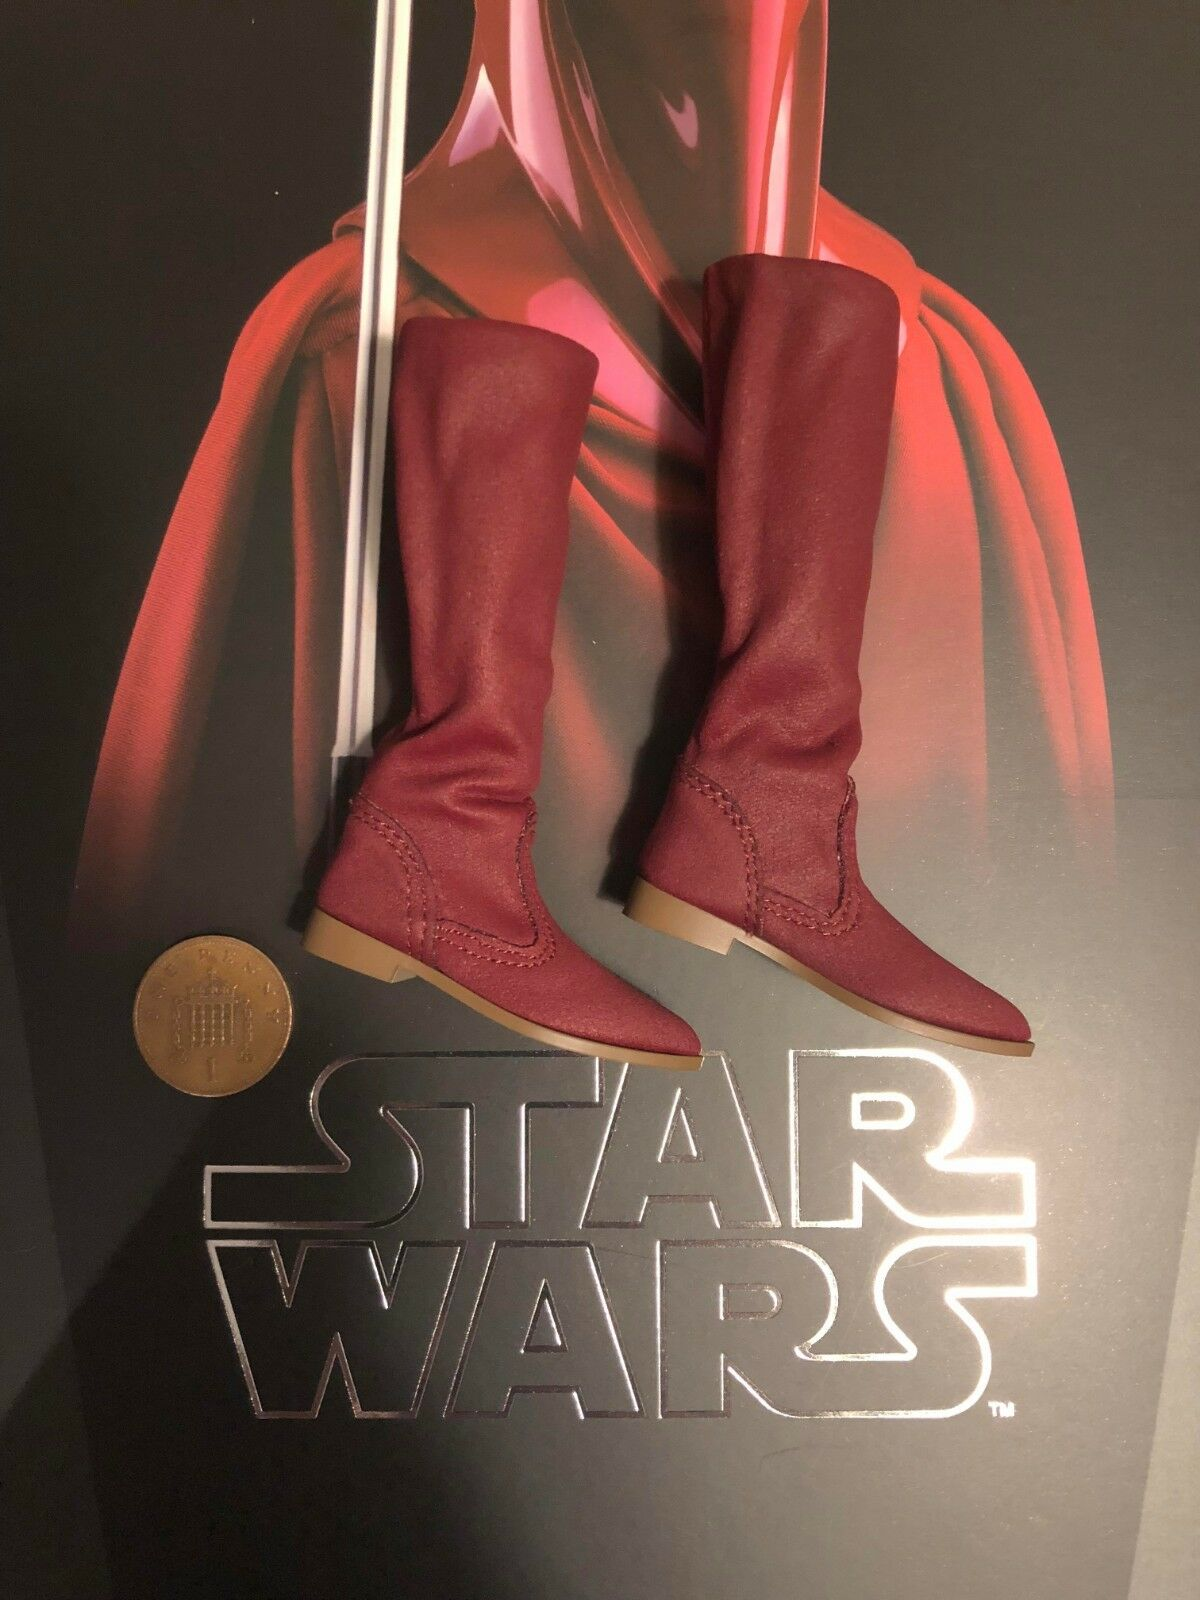 Heißes spielzeug star wars rotj königliche wache mms469 tall Stiefel los 1   6 - skala